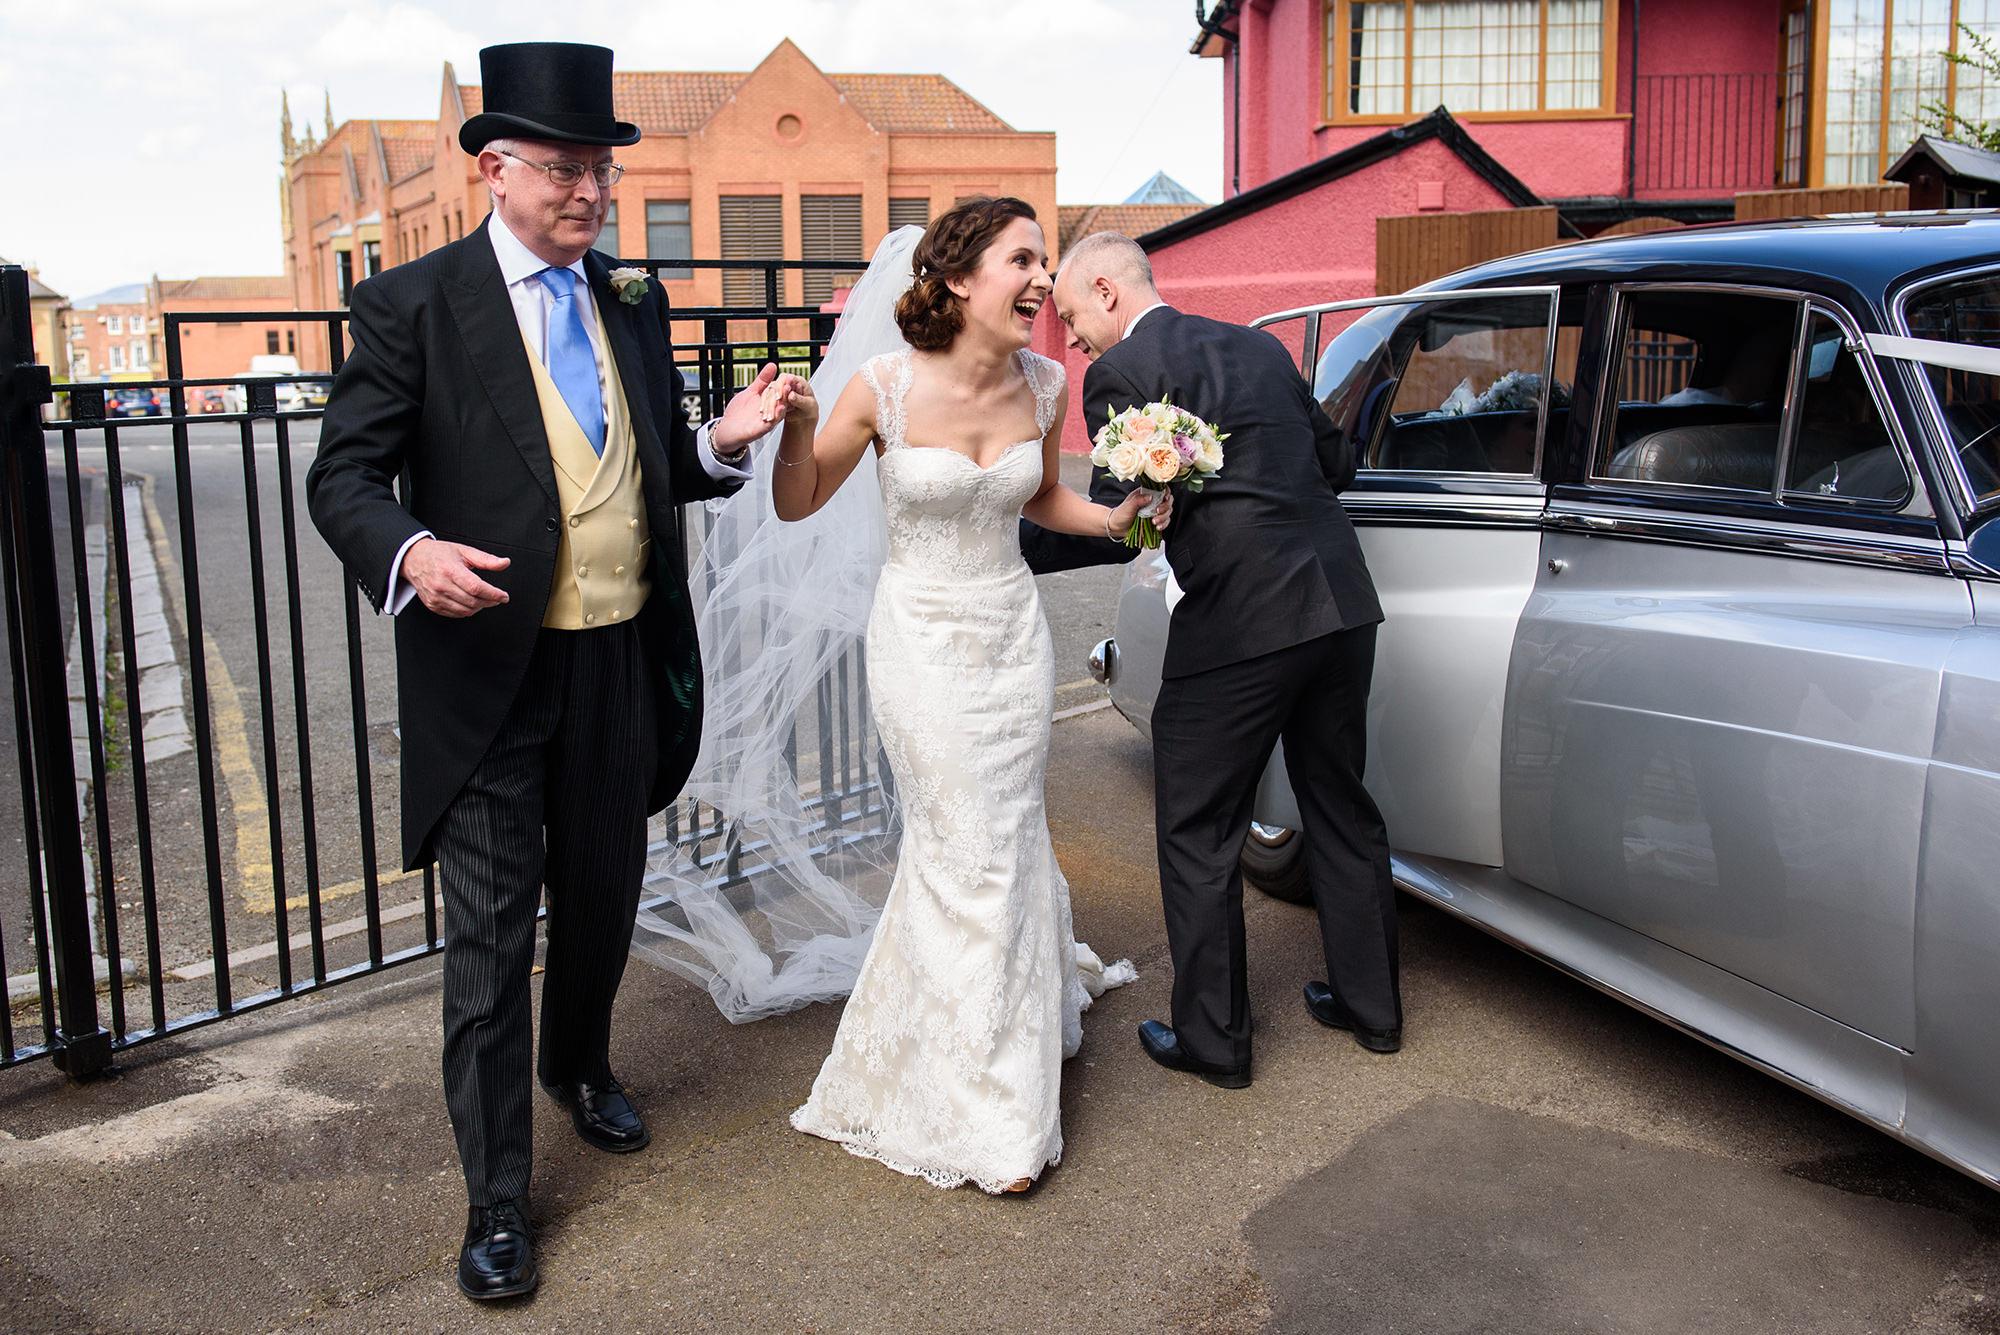 Simon biffen-best of 2015 wedding photographs-83